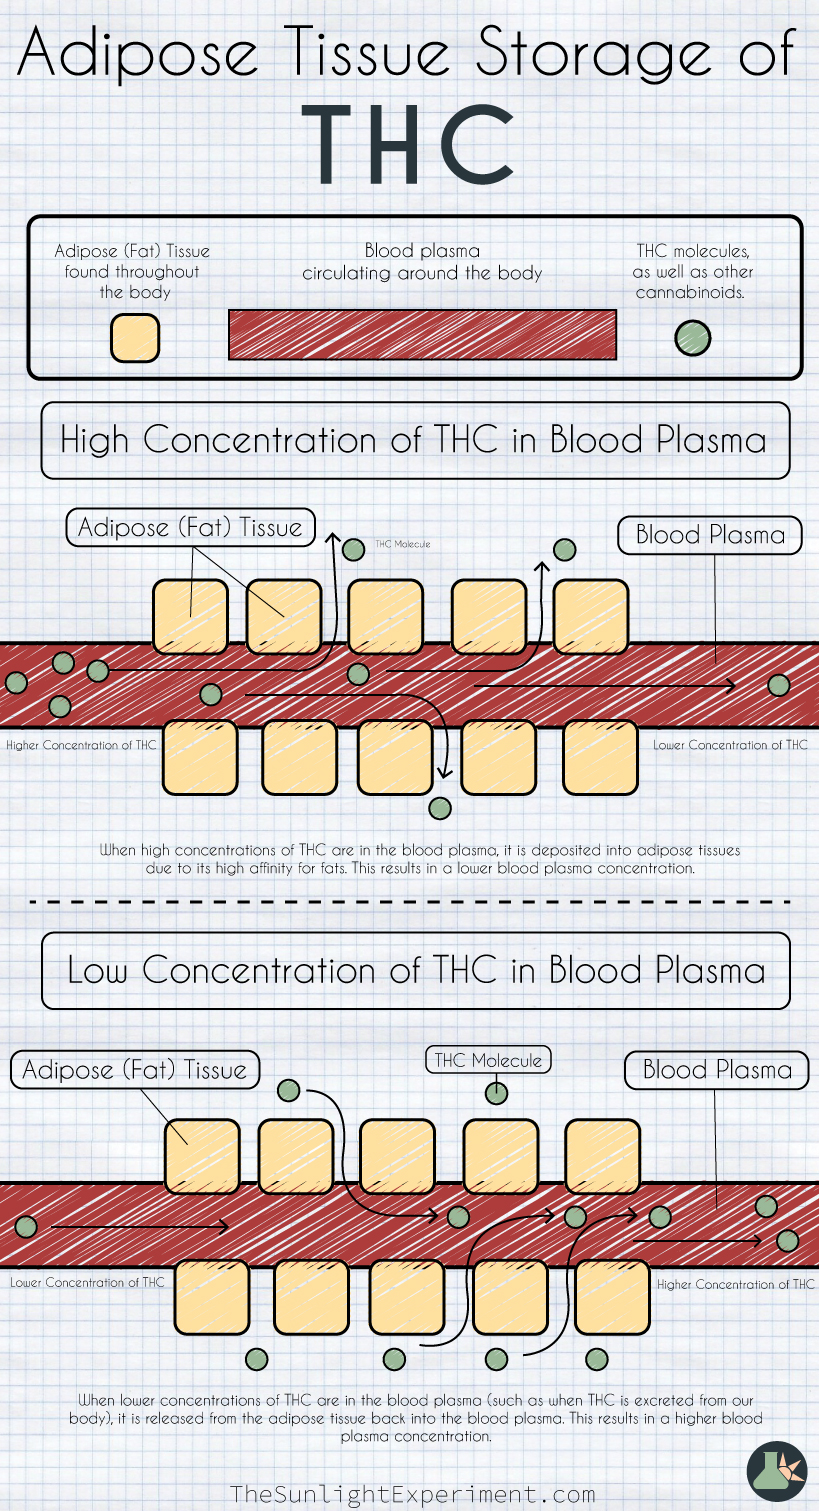 Adipose tissue storage of THC